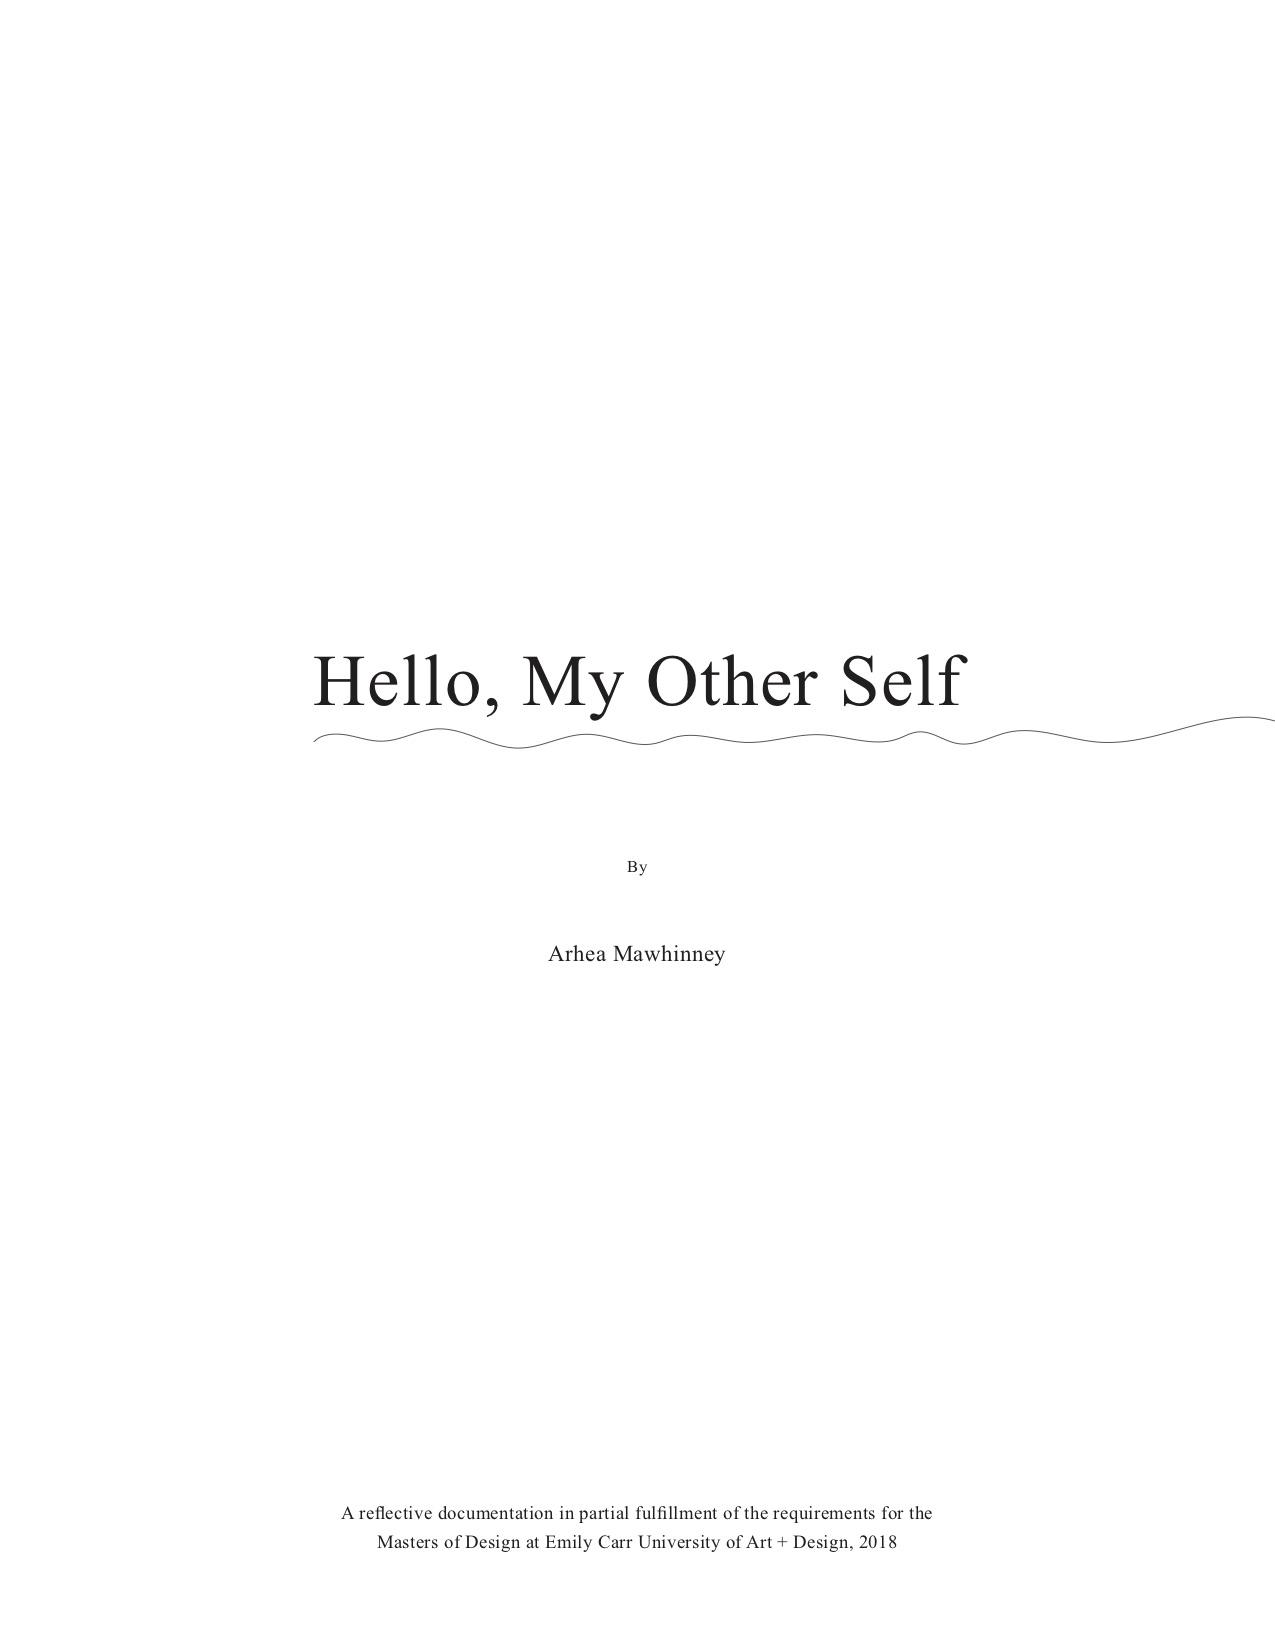 ArheaMawhinney_Hello, My Other Self (dragged).jpg